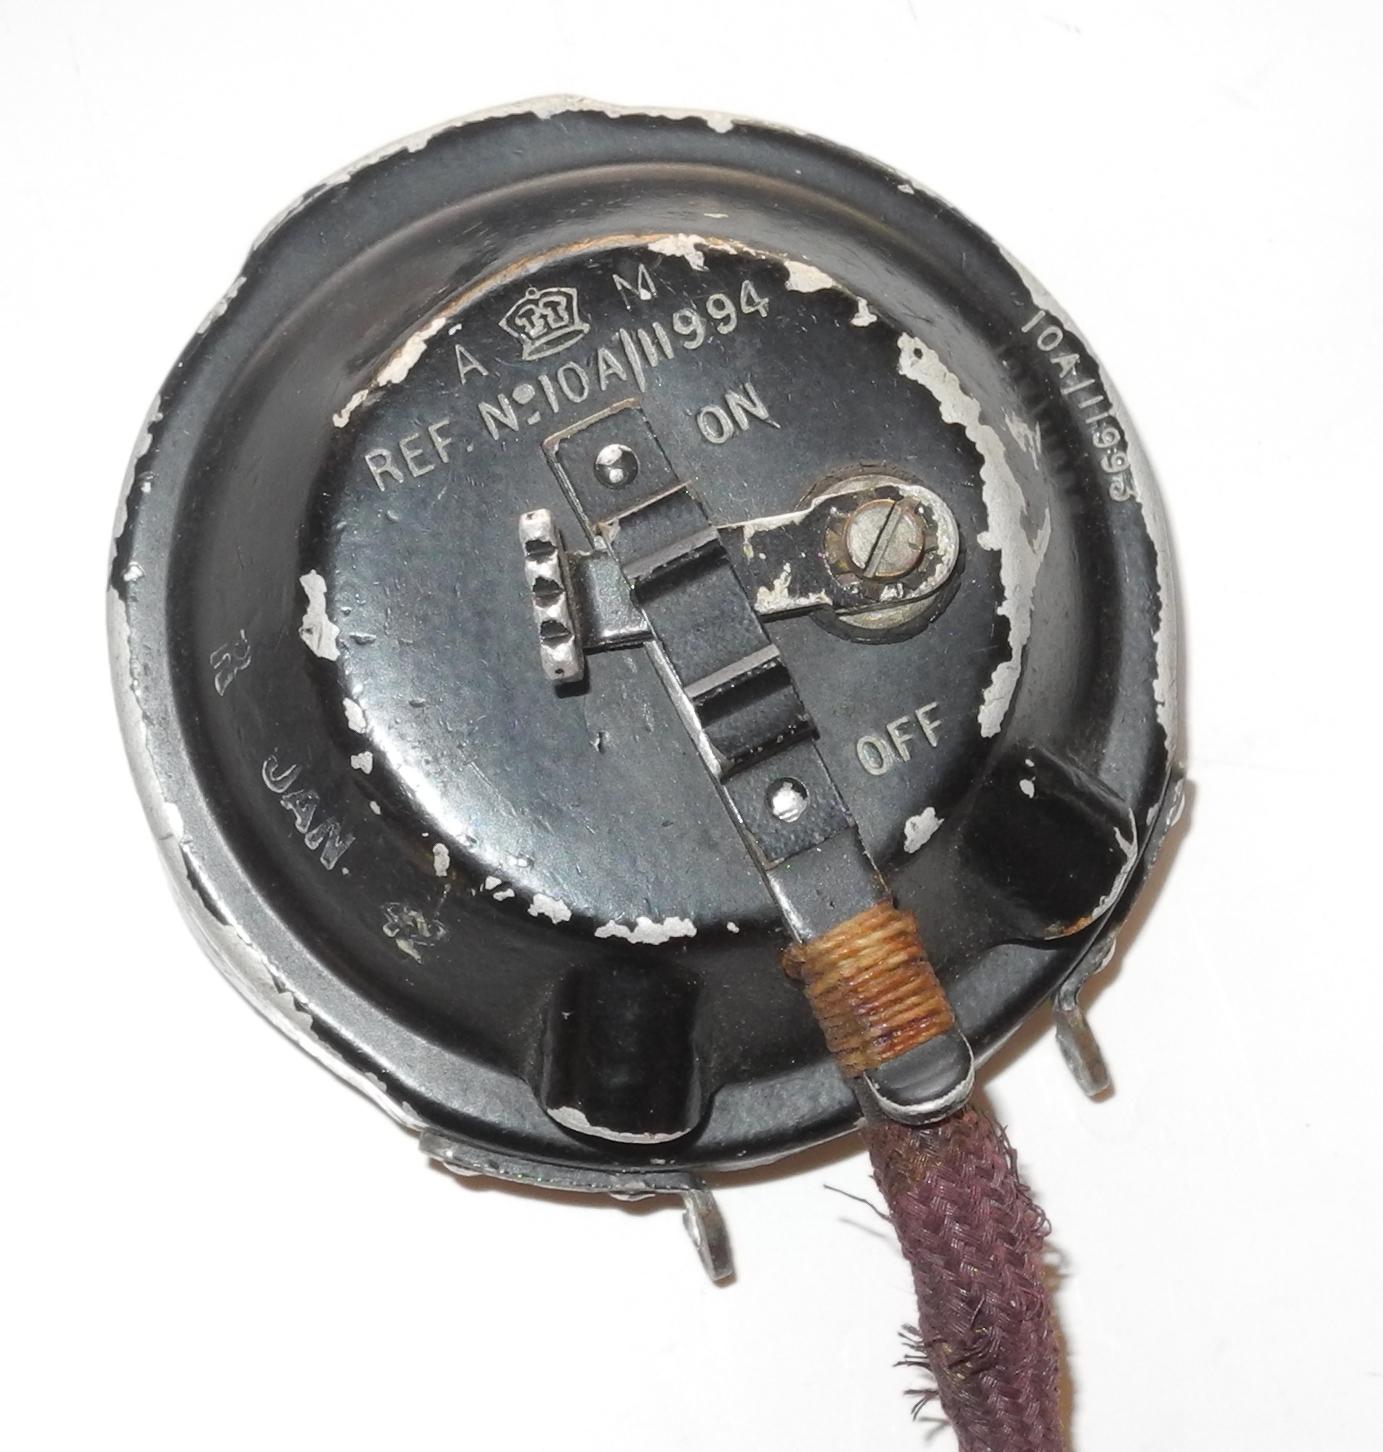 RAF Type 21 Microphone + cord